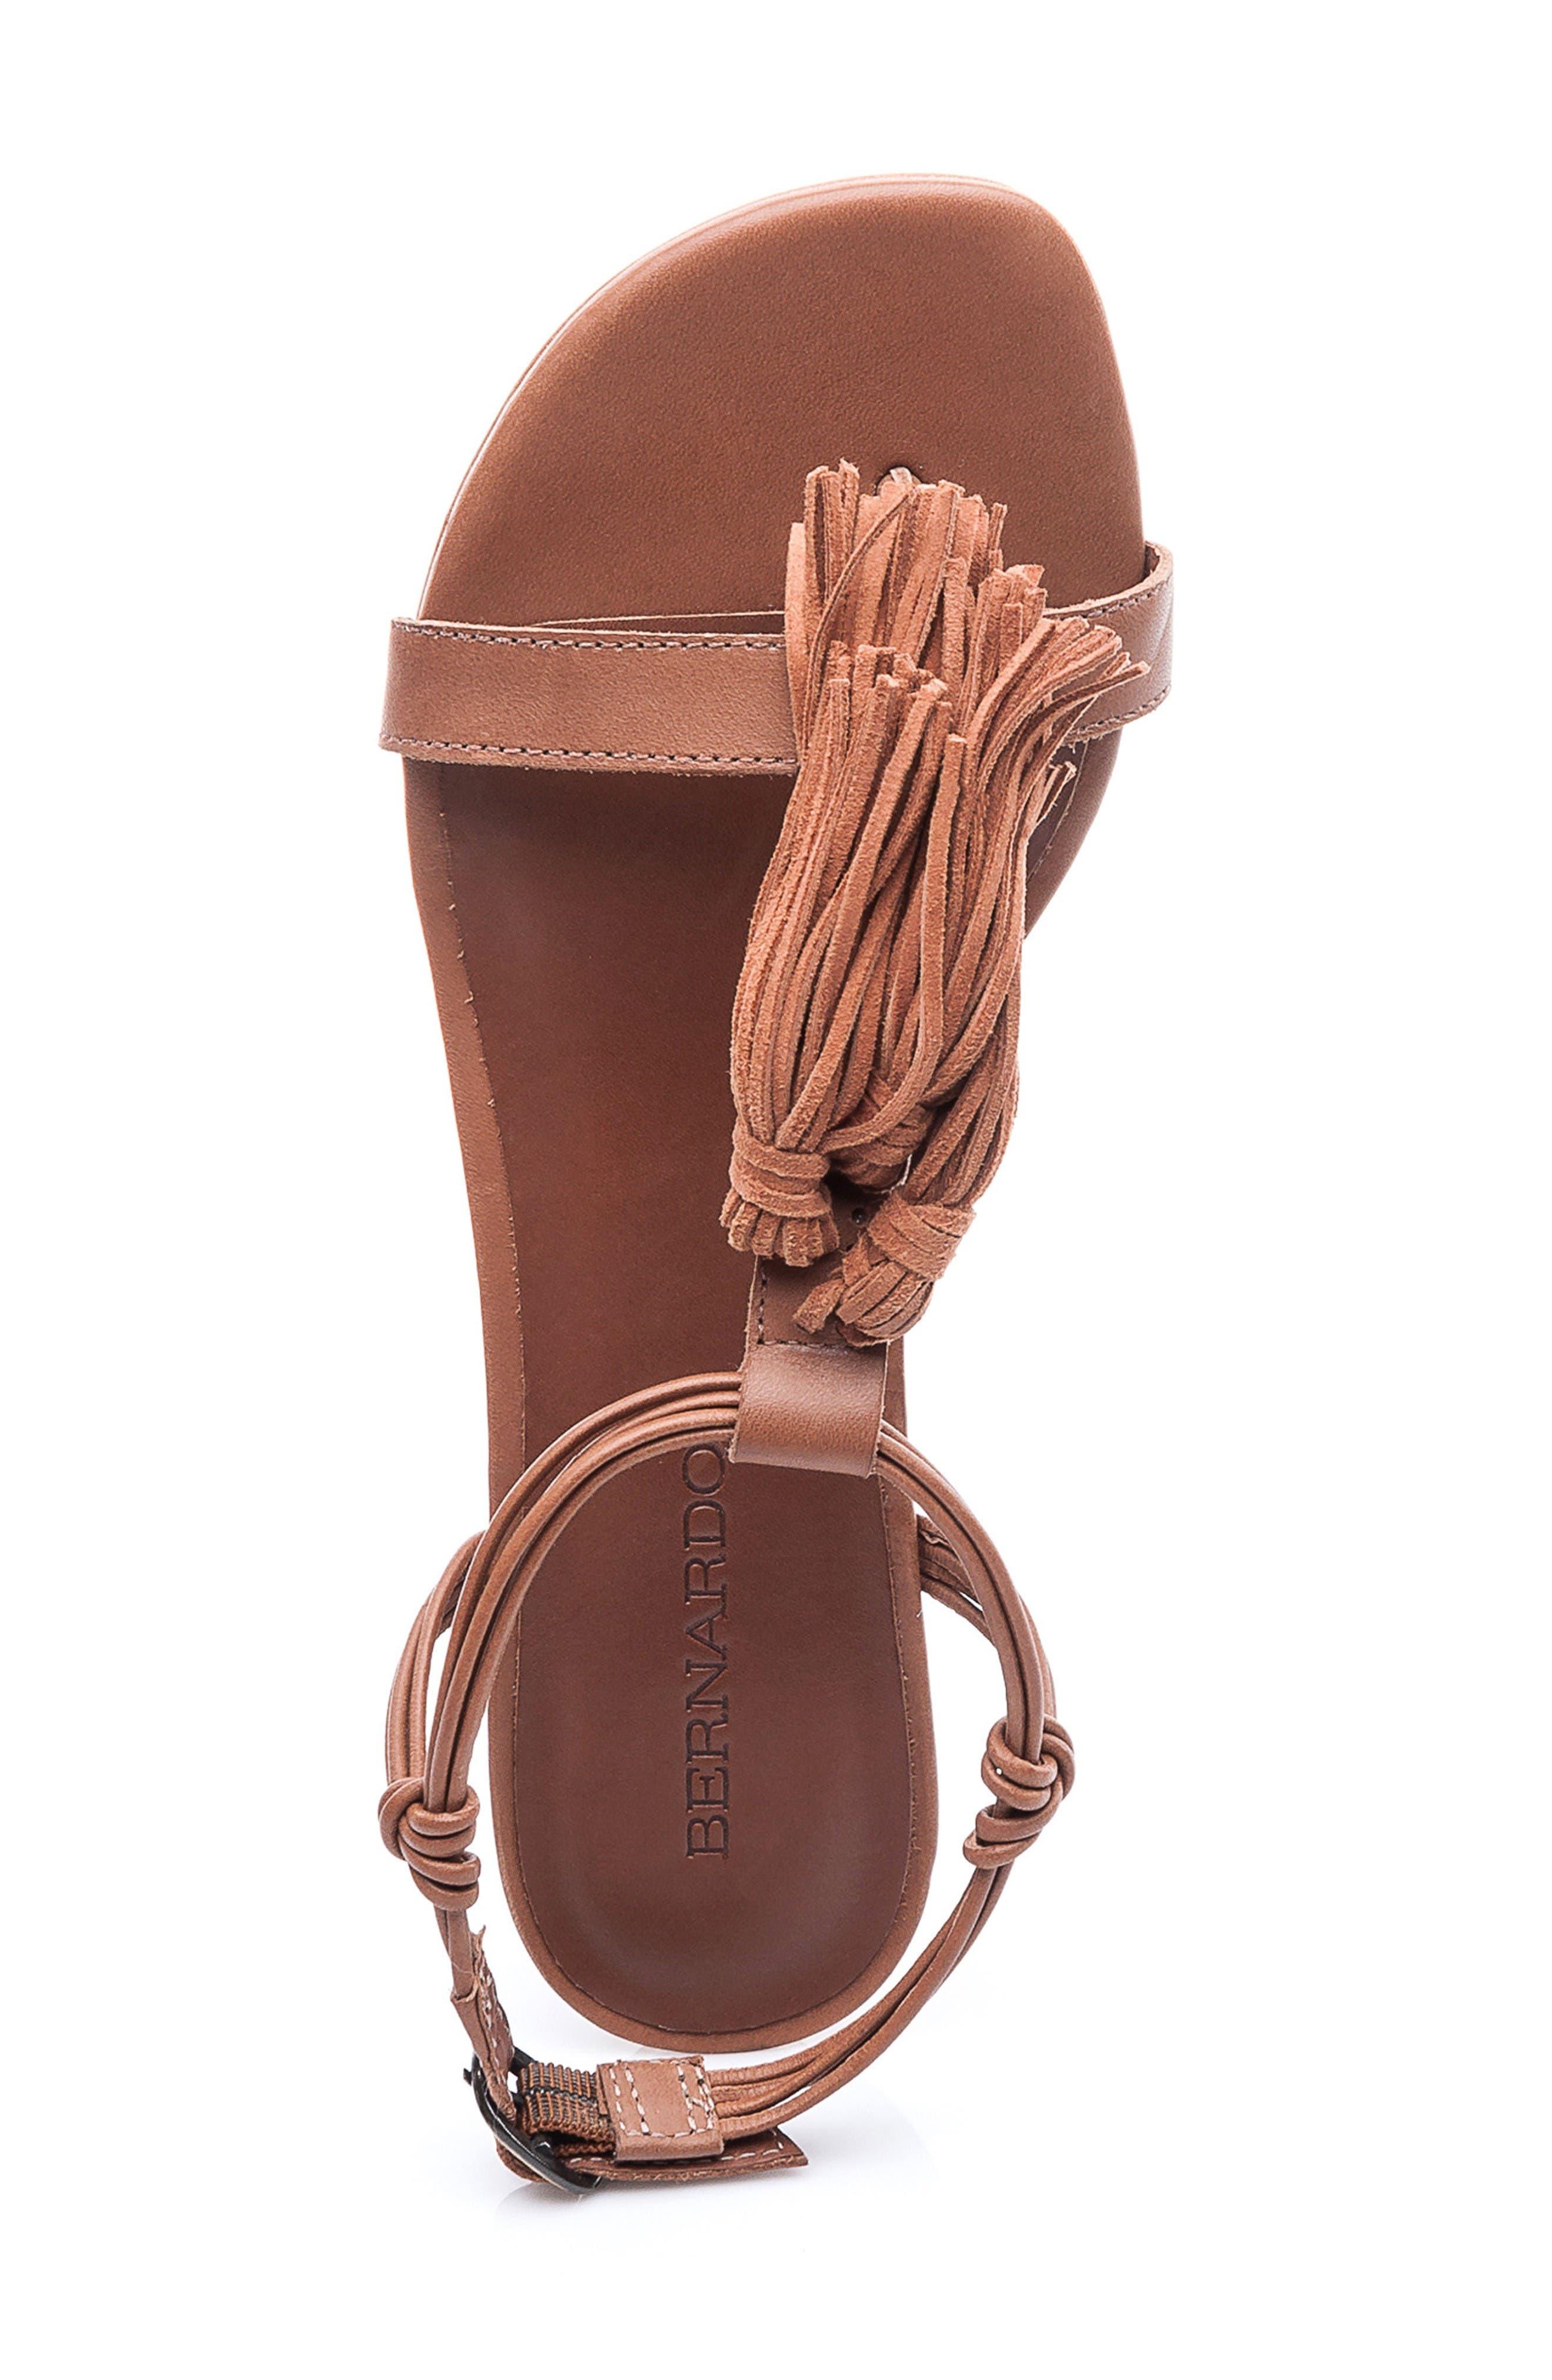 Footwear Court Fringe Leather Sandal,                             Alternate thumbnail 3, color,                             Luggage Leather